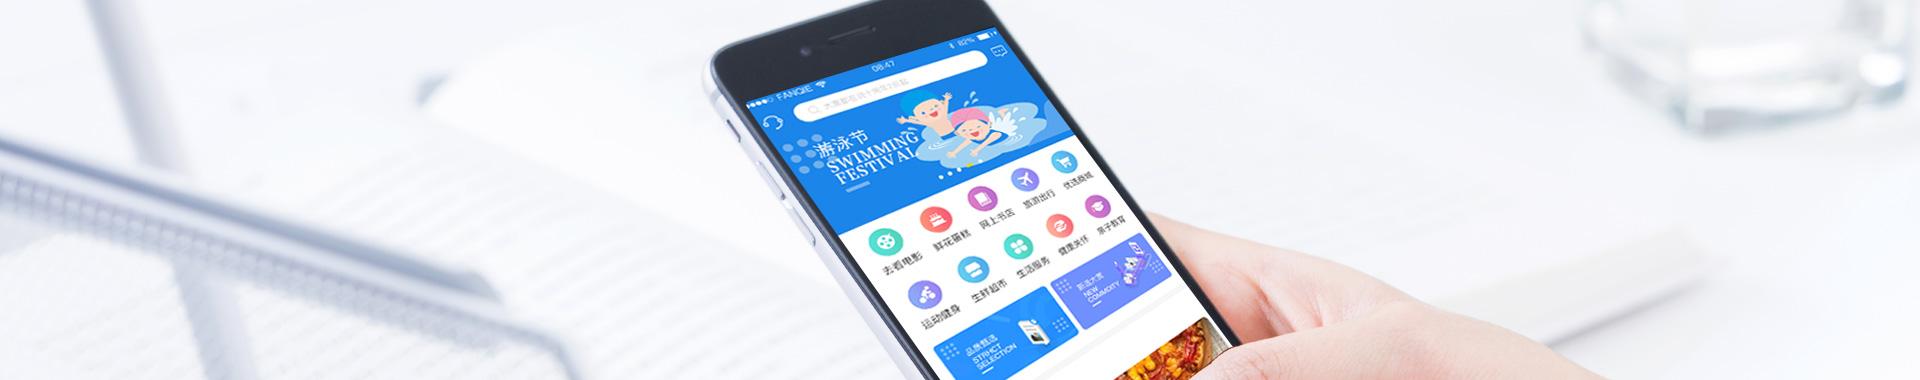 香港App開發_app定制_蘋果app開發_安卓app開發_ios開發